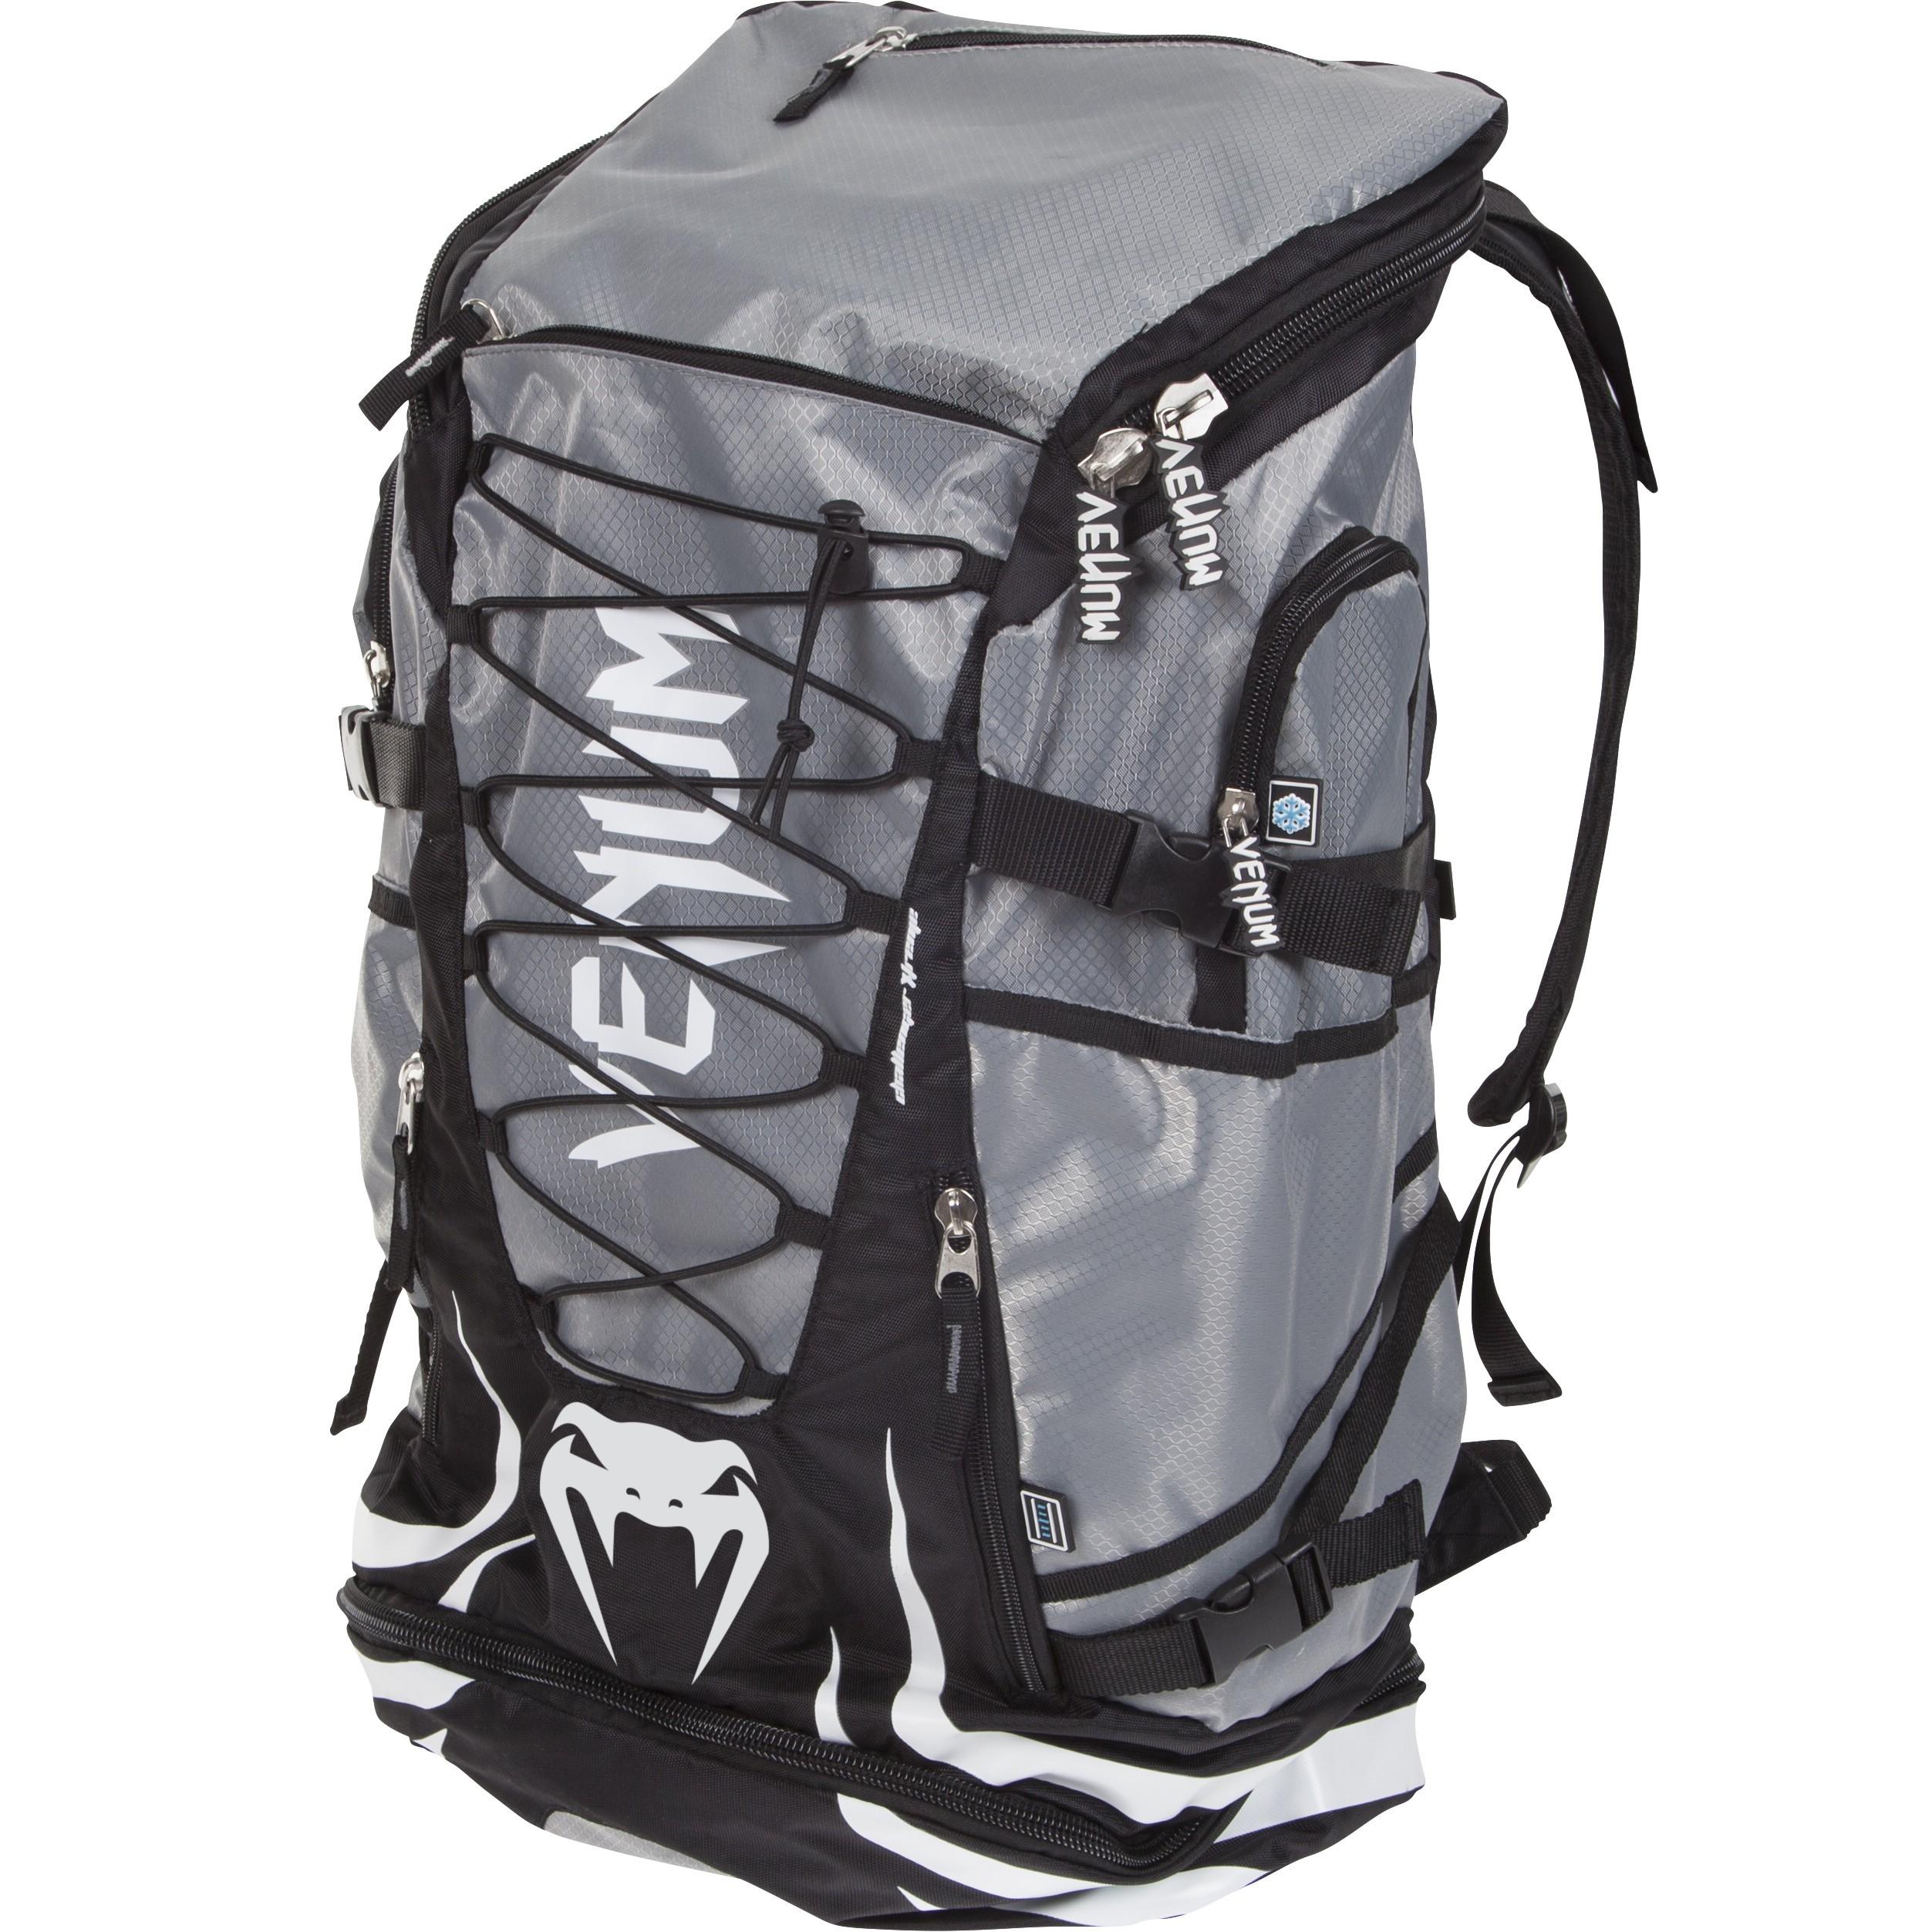 Рюкзак Venum Challenger Xtreme Black/Grey<br>Вес кг: 0.00000000;